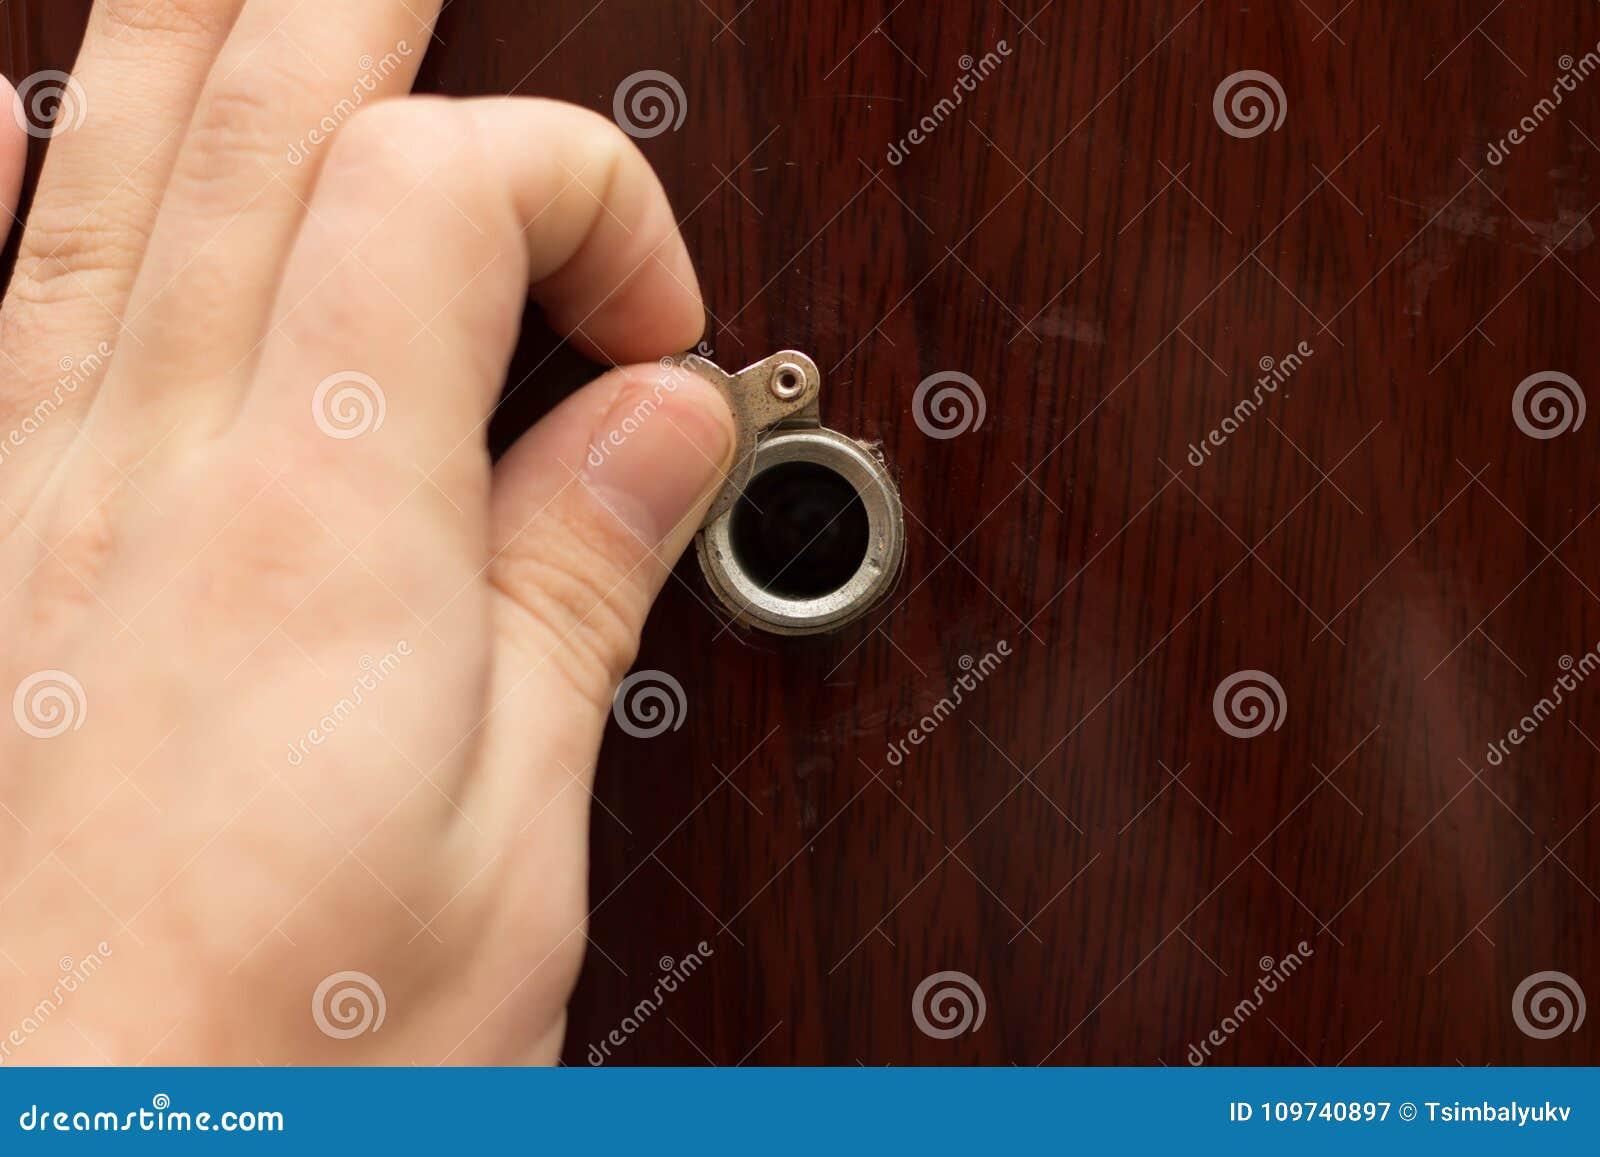 Superior Peephole On Wooden Door   Judas Hole Stock Image   Image Of Look, Care:  109740897